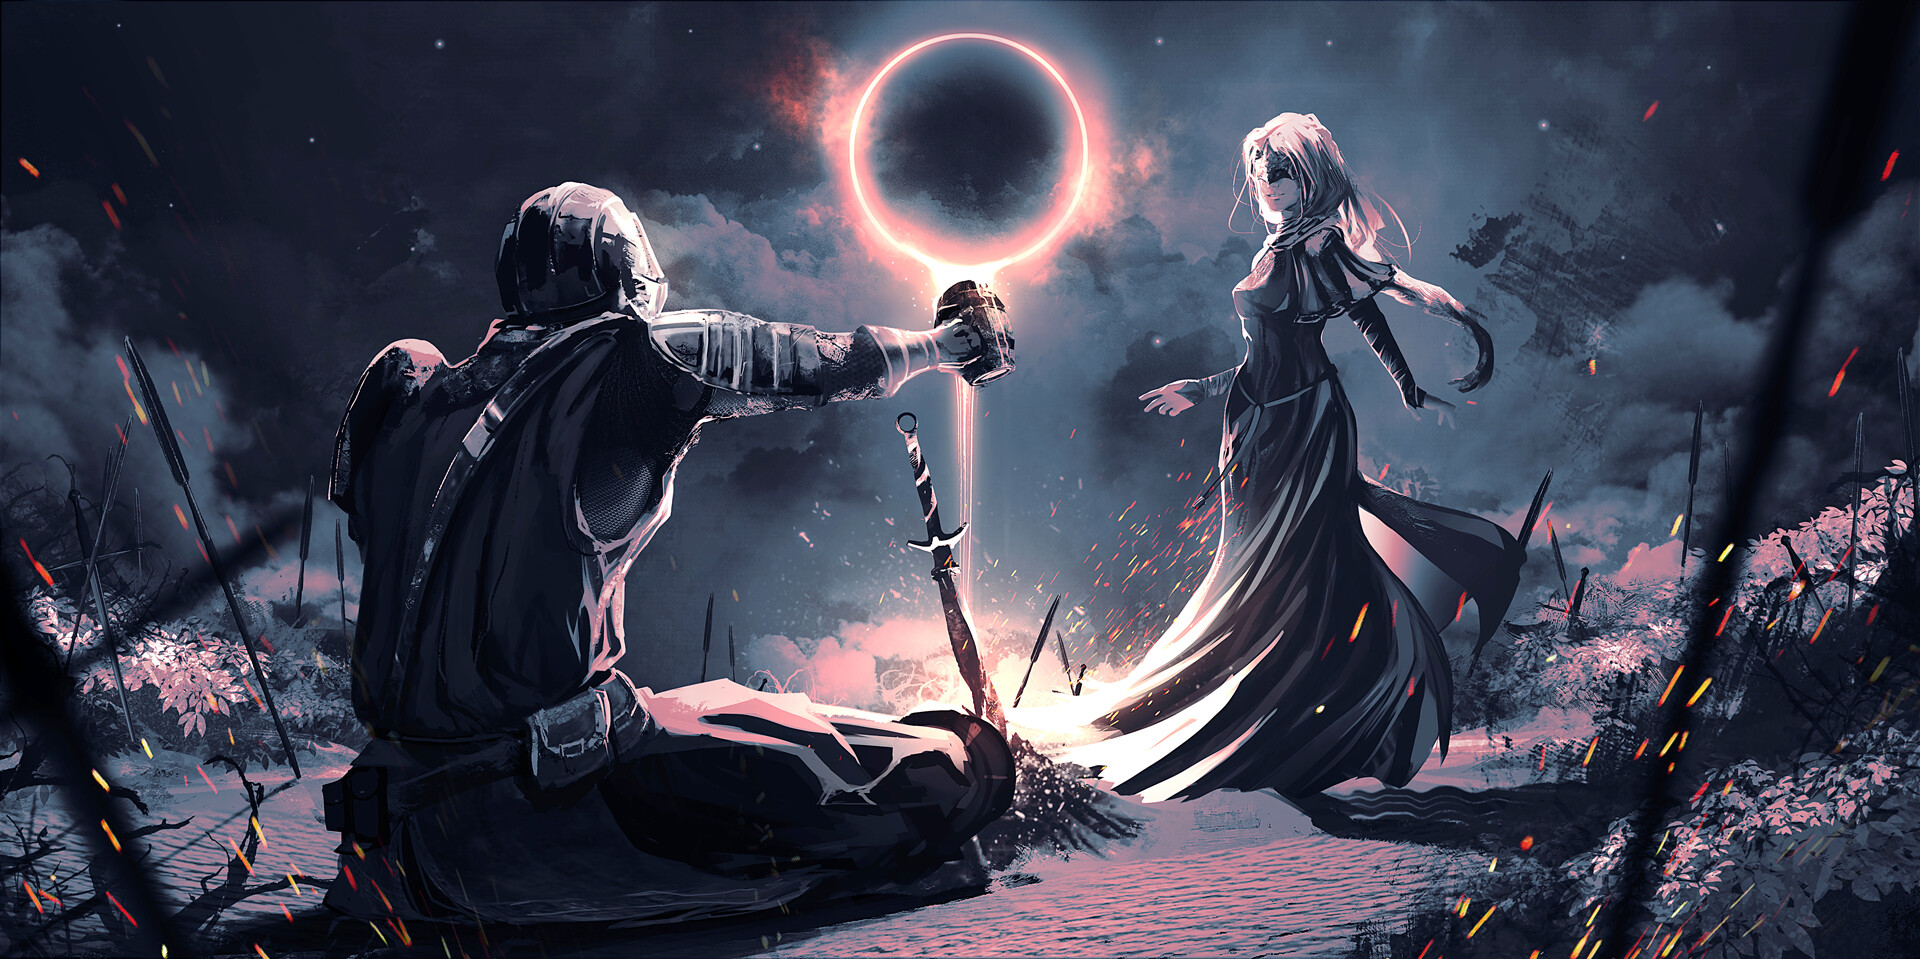 General 1920x959 Rashed AlAkroka dark souls 3 fantasy art sword knight eclipse  sparks women dress mug bonfire fire keeper